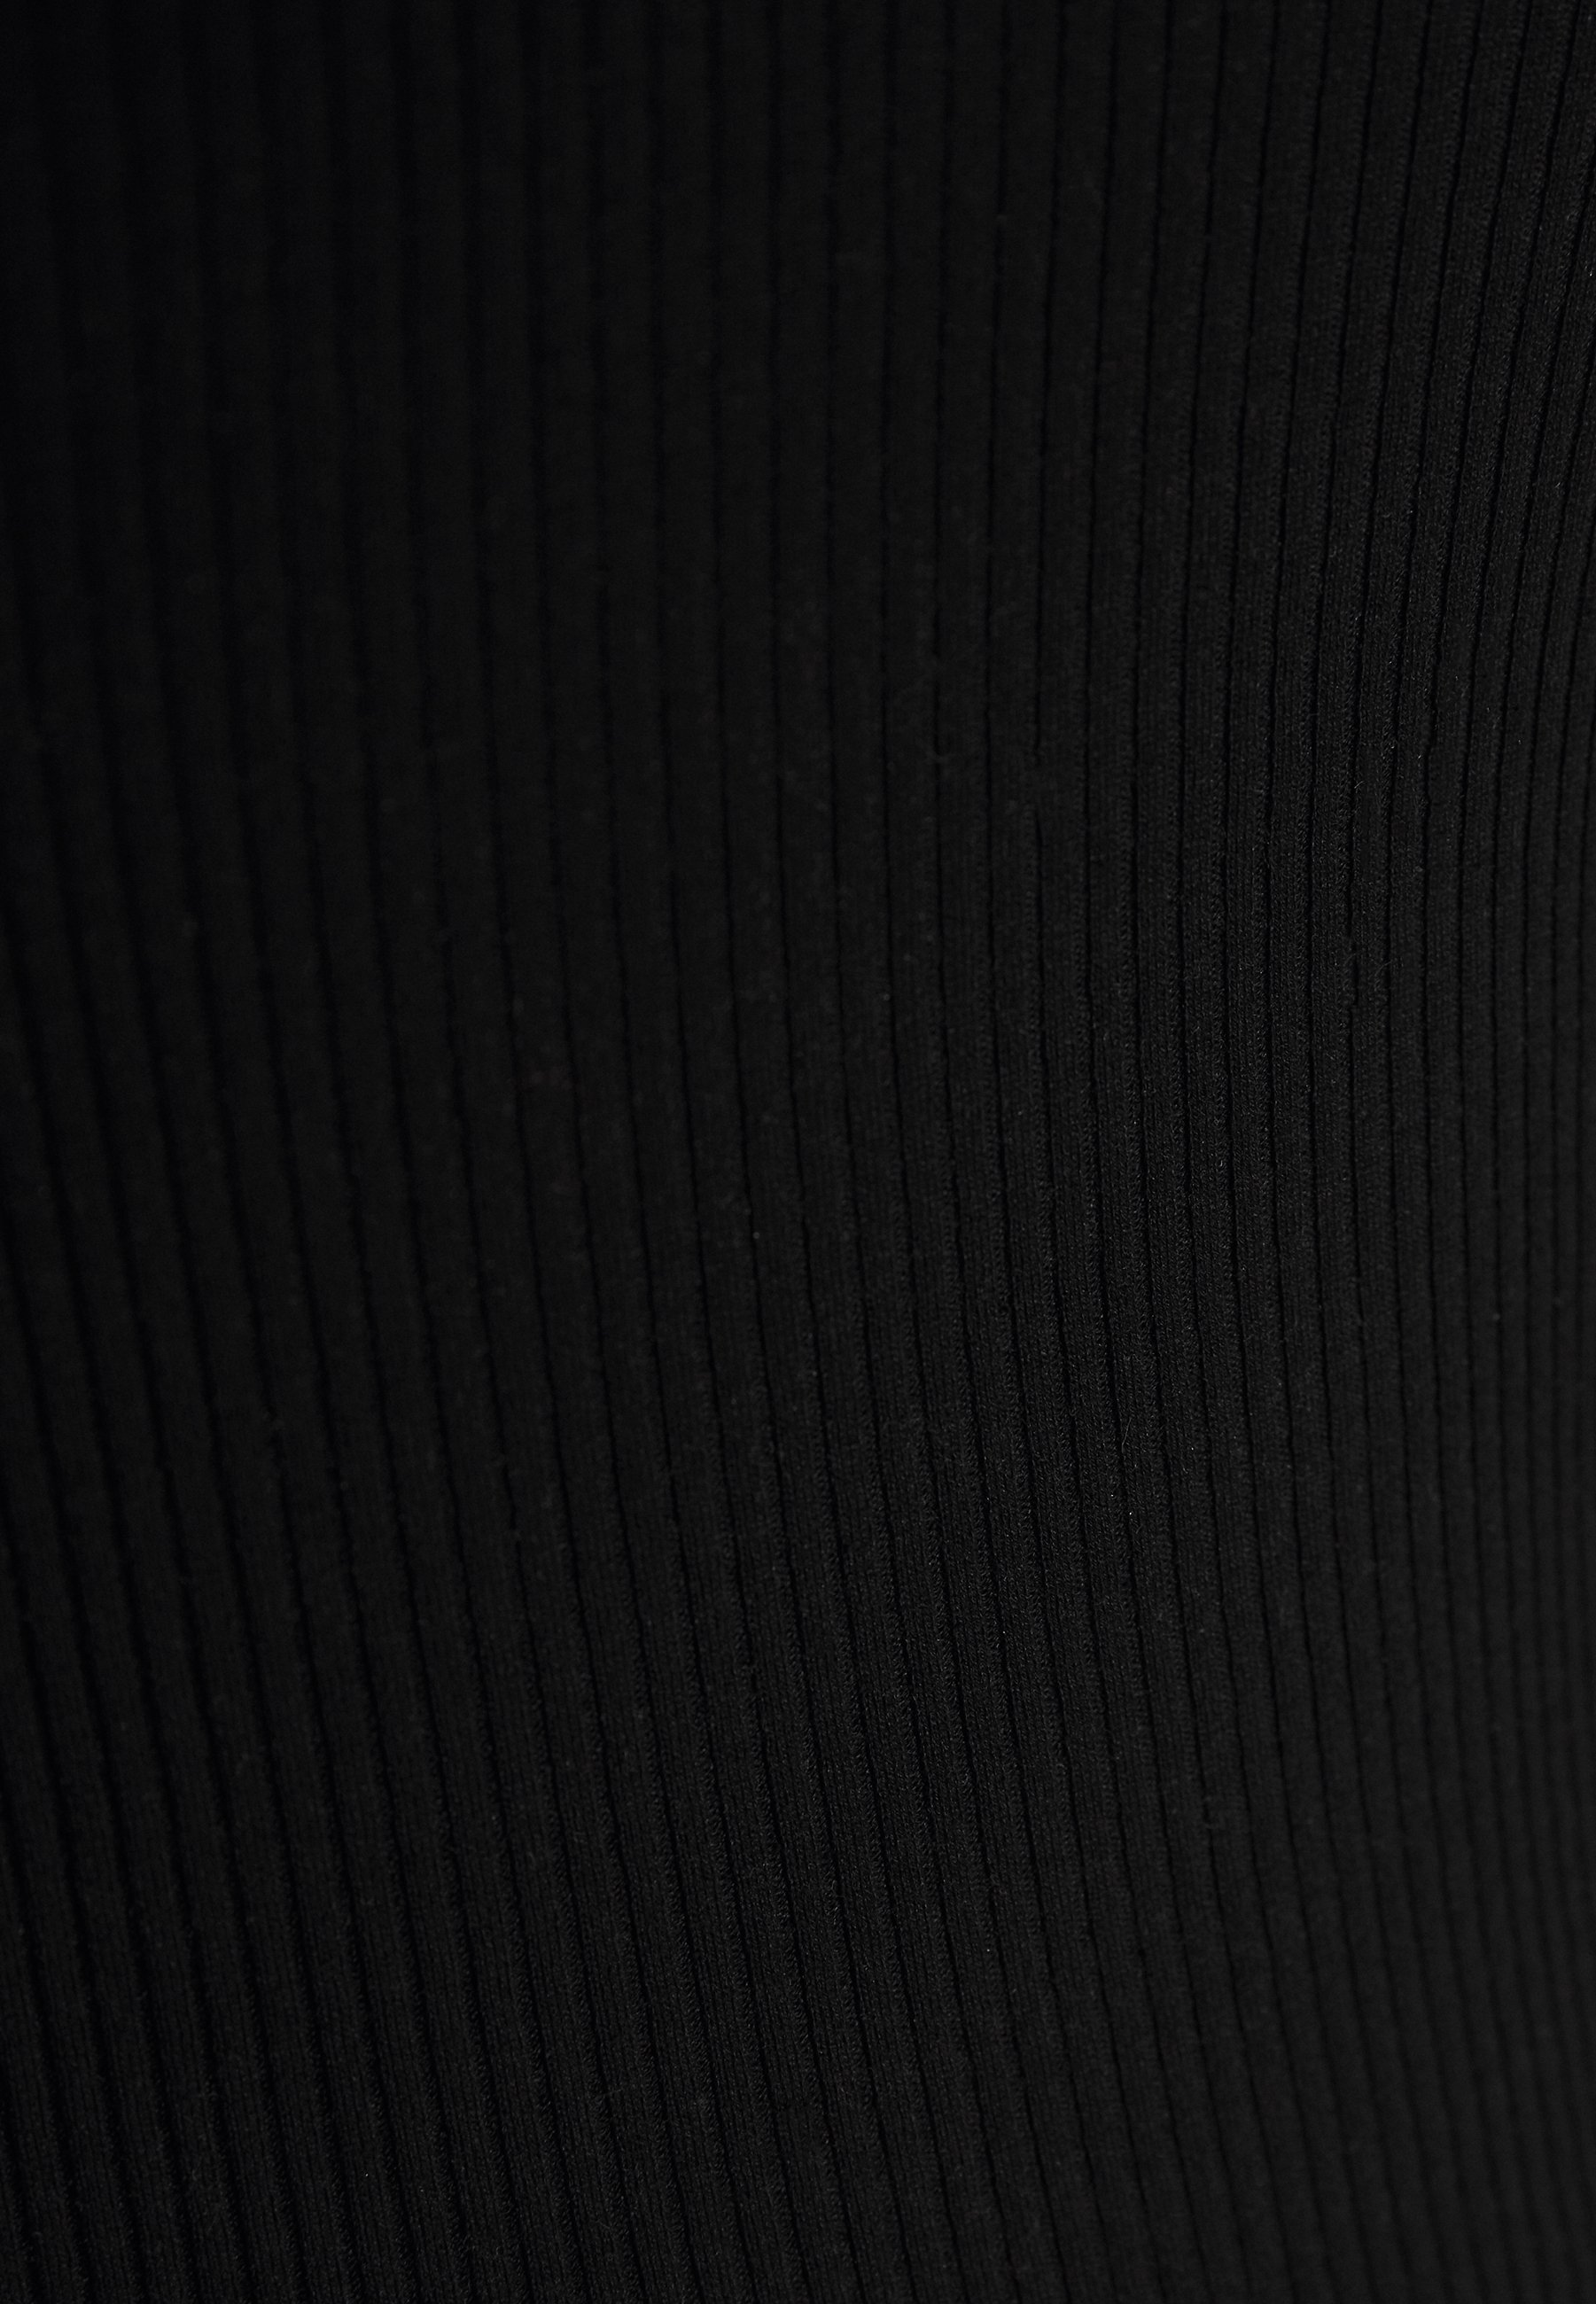 Rosemunde Regular - T-shirt À Manches Longues Black 0rsfMJP